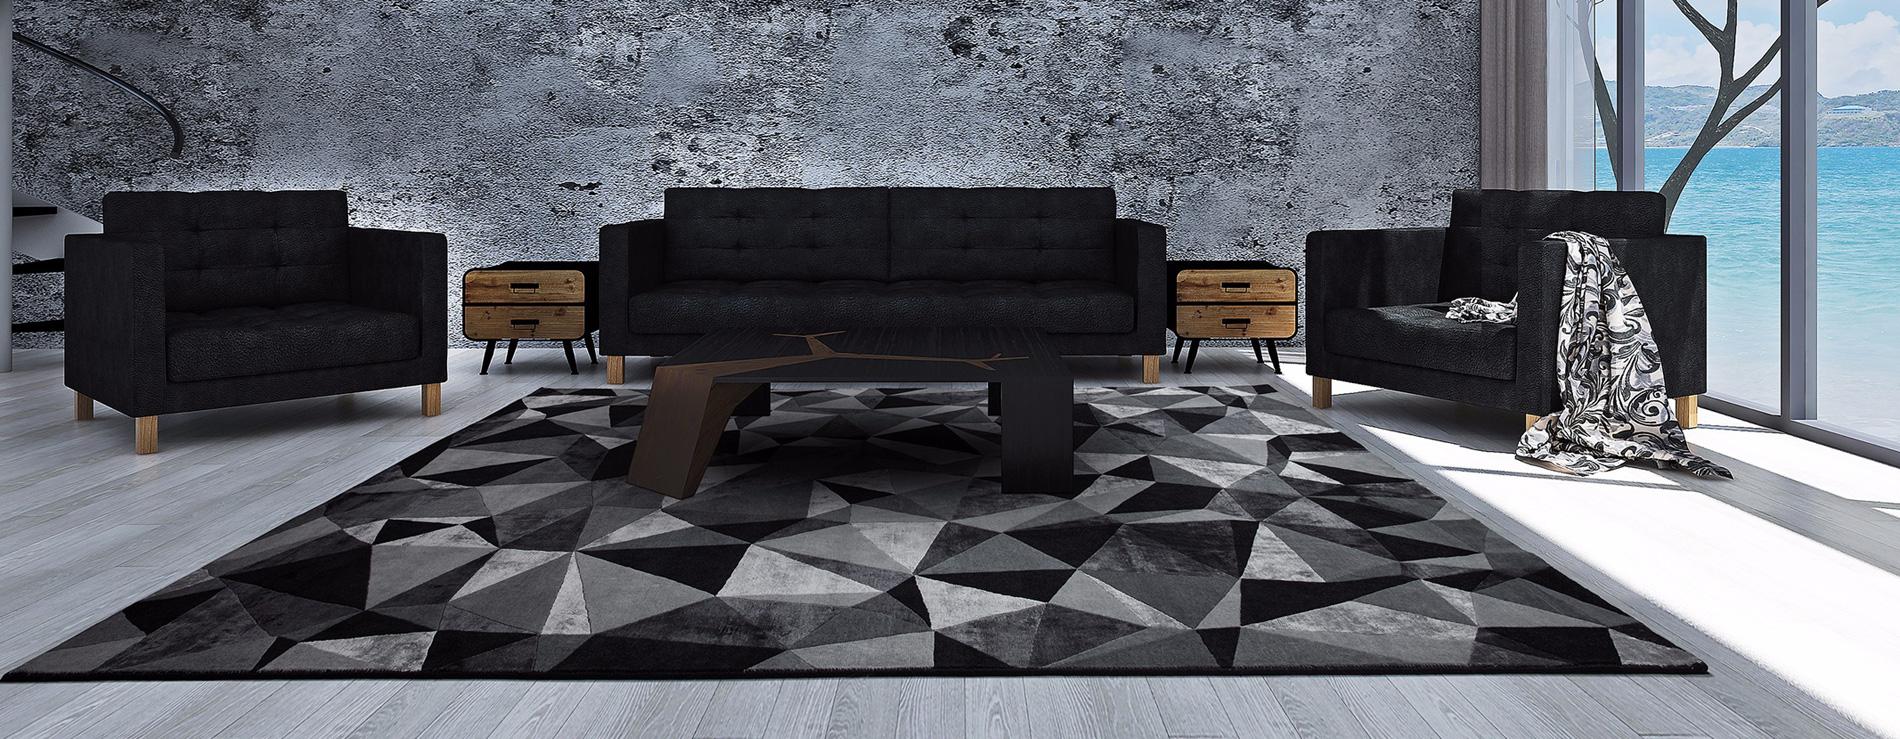 Tappeto geometrico Kaleidoscope - Sitap